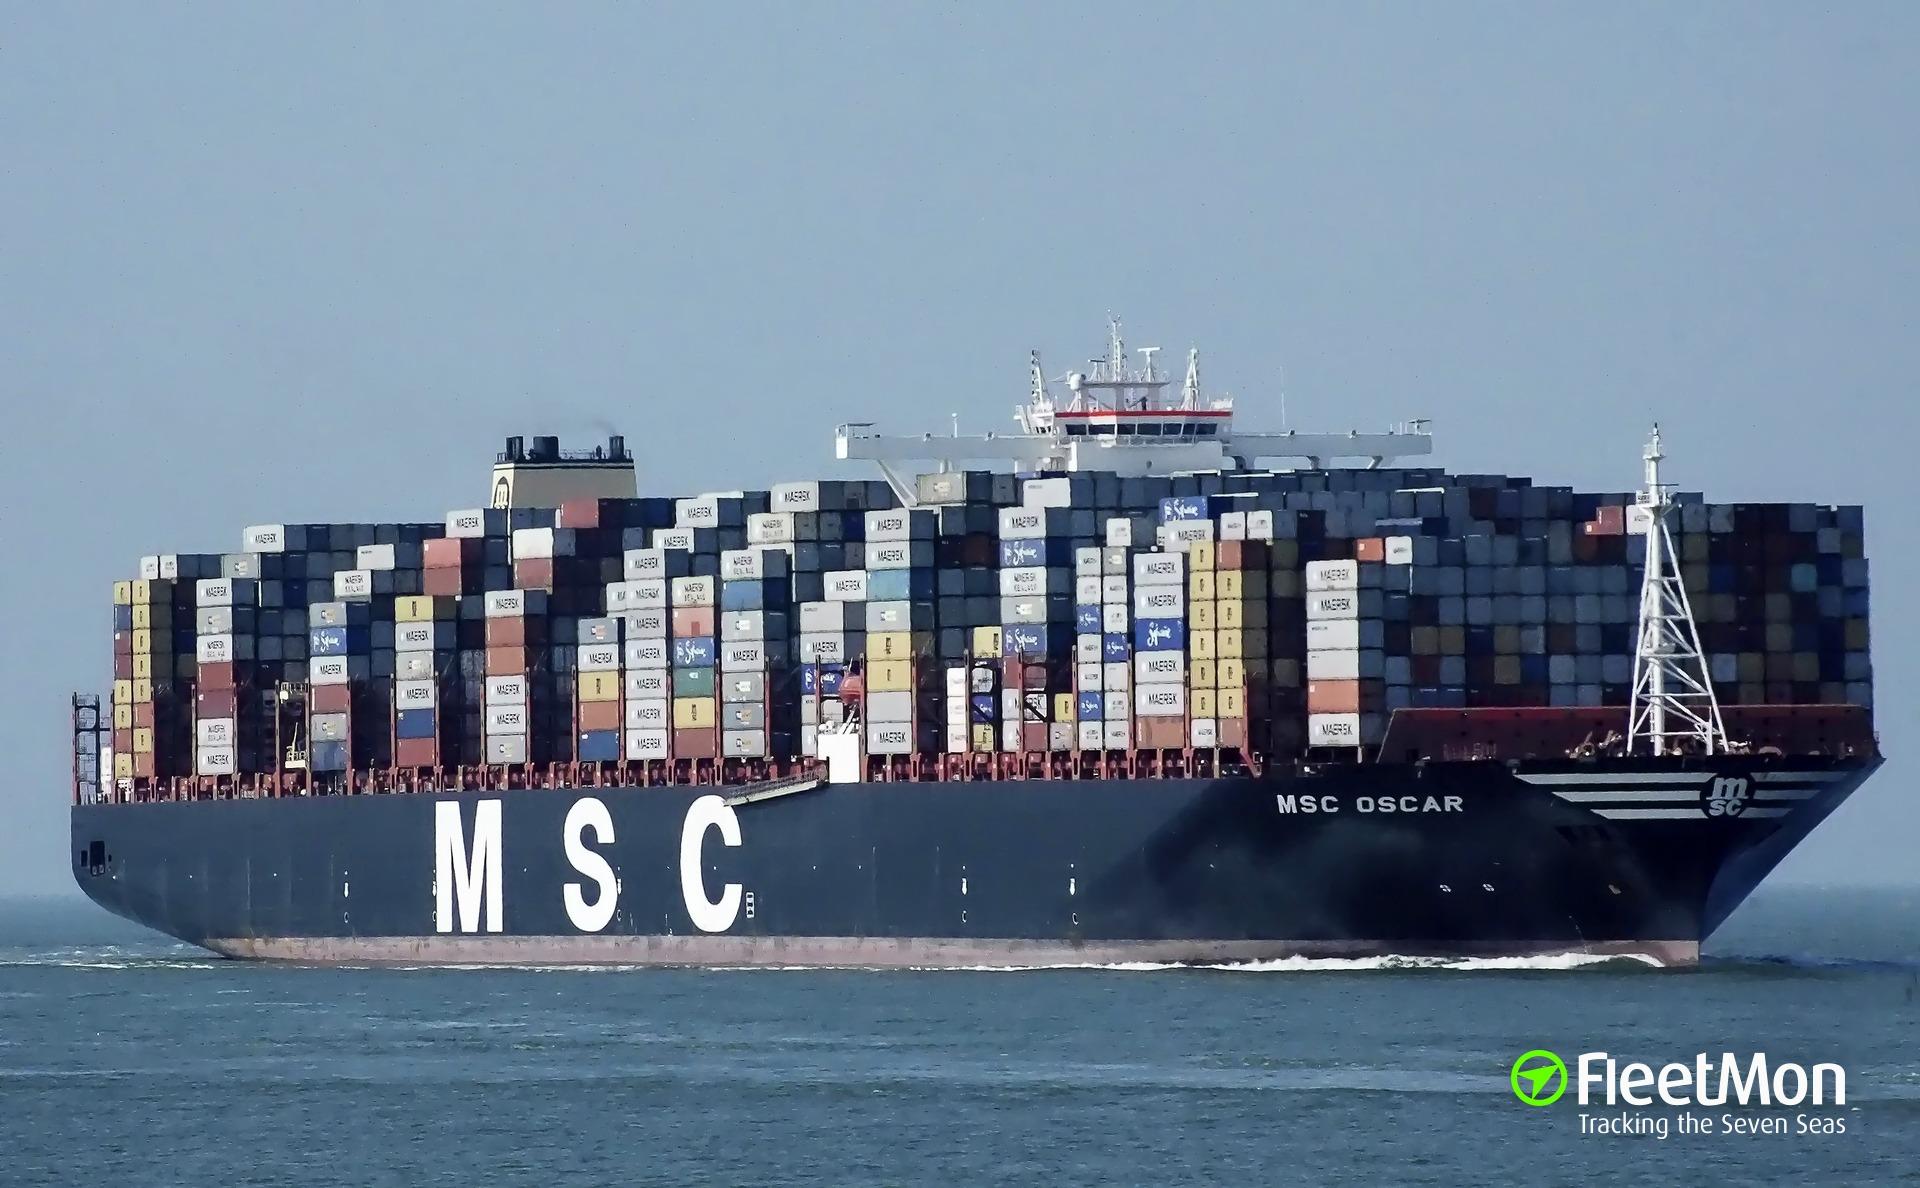 Gps Fleet Tracking Pricing >> Photo of MSC OSCAR (IMO: 9703291, MMSI: 355906000, Callsign: 3FBT7) taken by Becks93